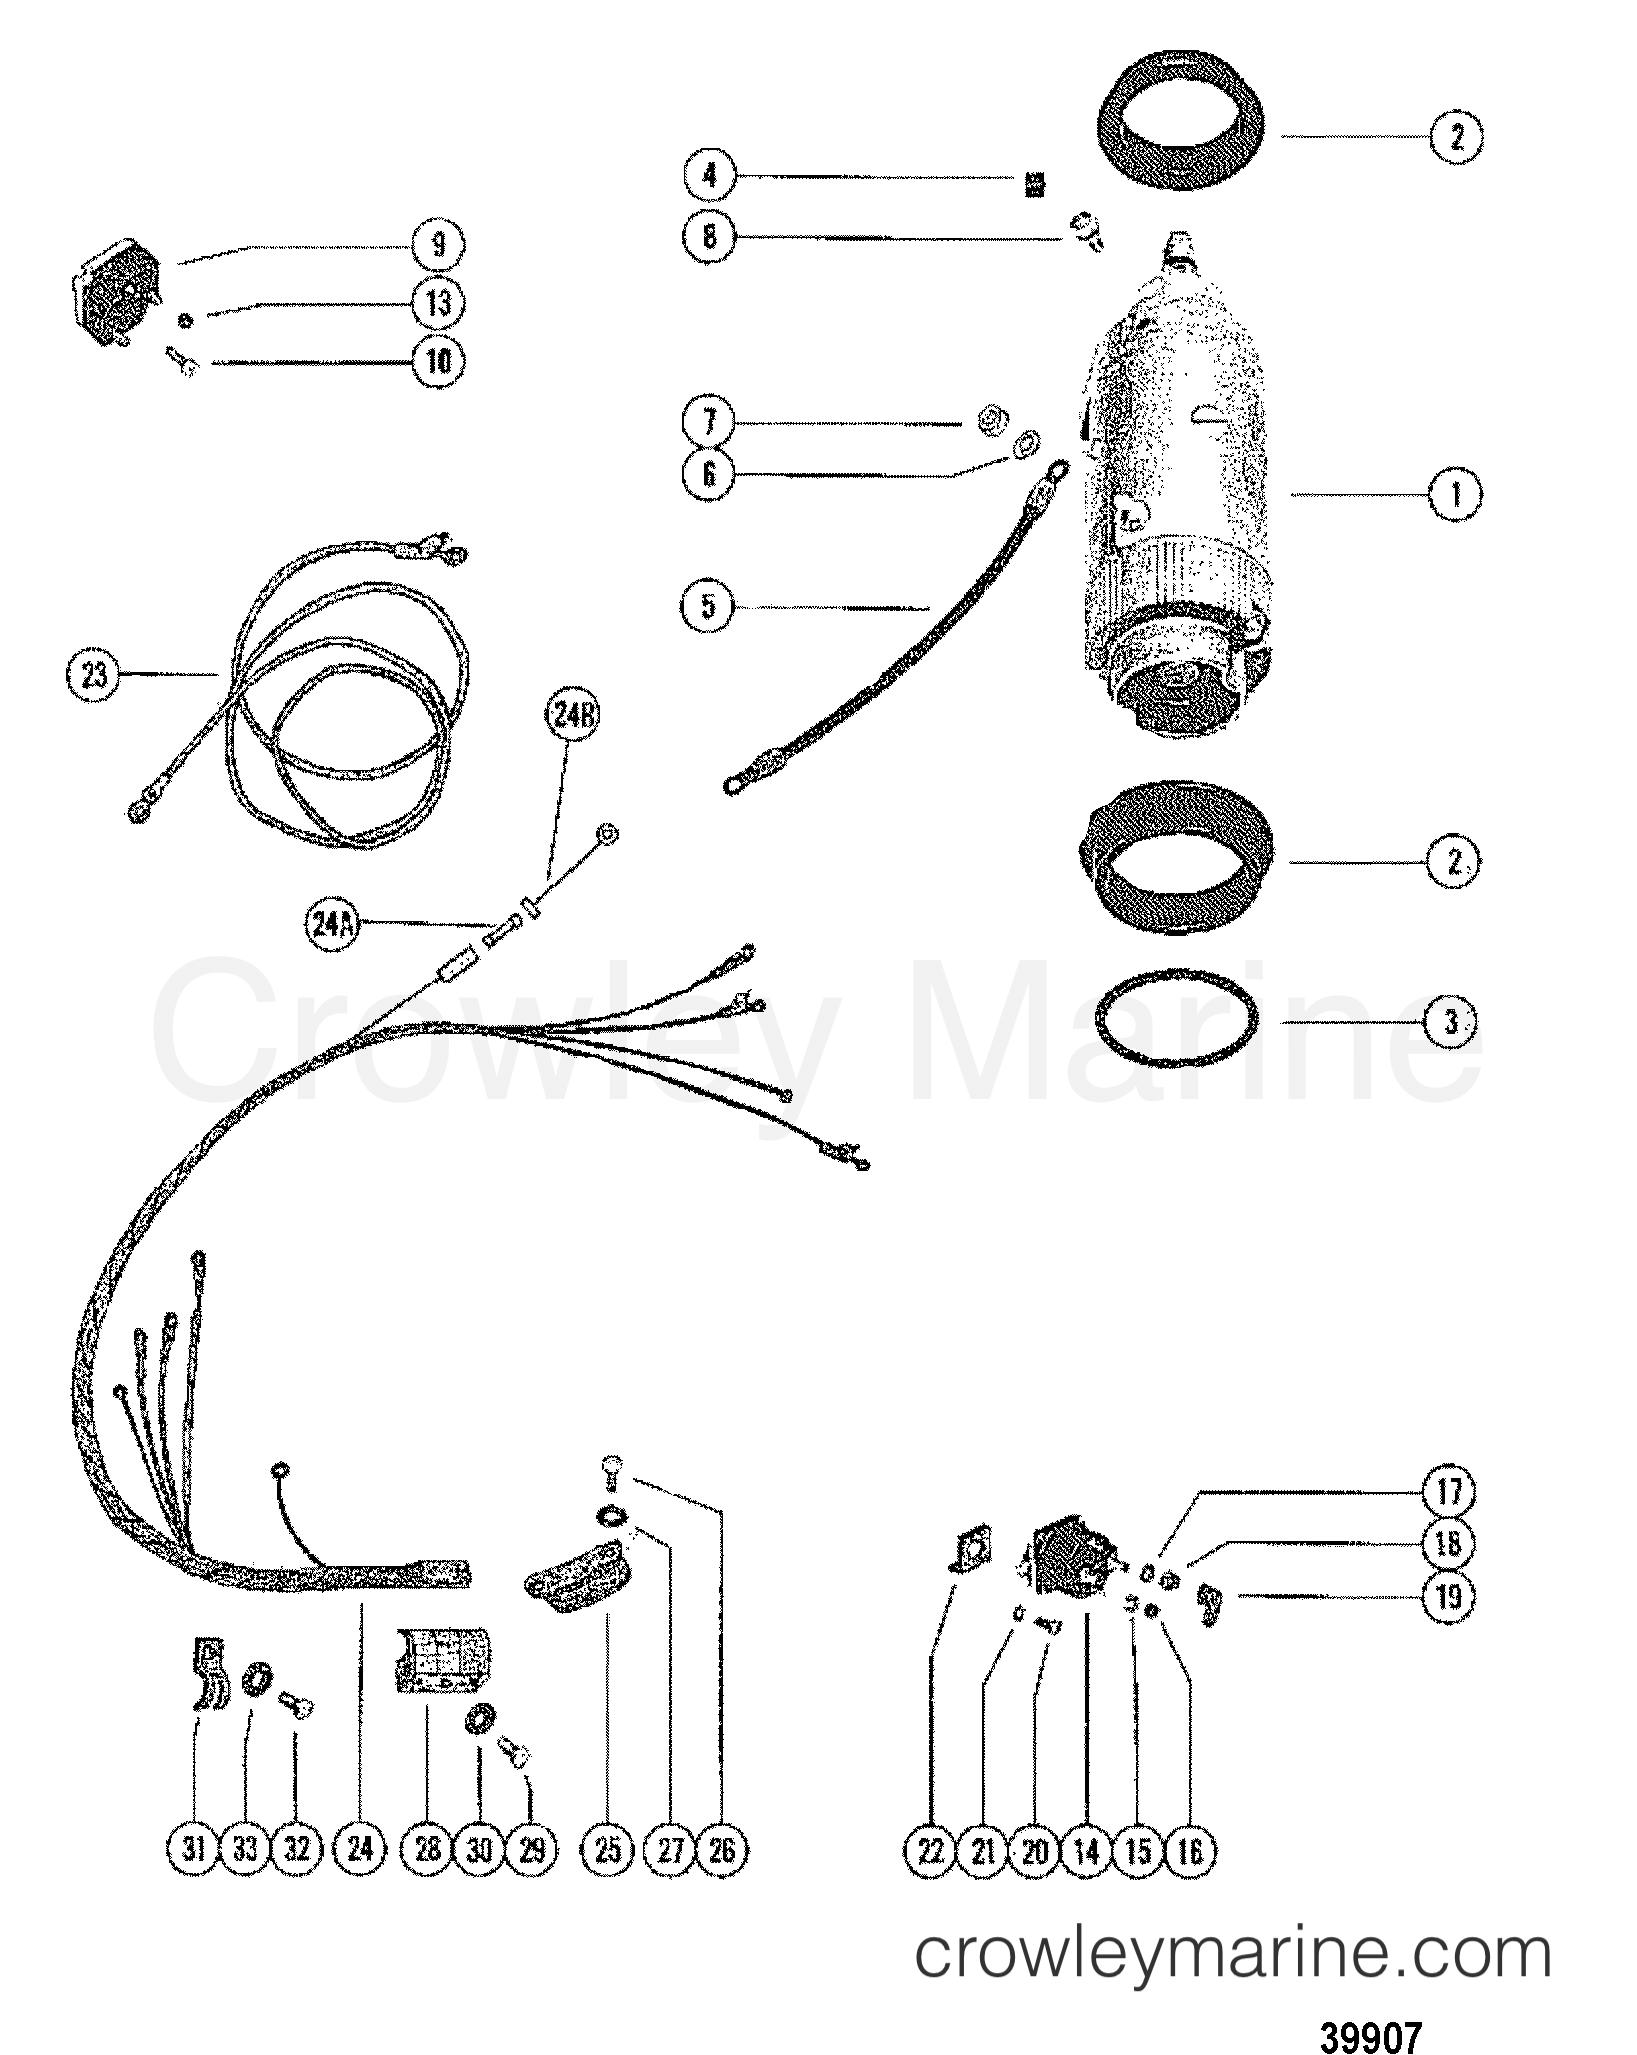 IXPUtt9w  Omc Wiring Diagram on apc wiring diagram, clark wiring diagram, sears wiring diagram, johnson wiring diagram, nissan wiring diagram, omg wiring diagram, 1972 50 hp evinrude wiring diagram, 96 evinrude wiring diagram, john deere wiring diagram, omc schematic diagrams, sea ray wiring diagram, atlas wiring diagram, viking wiring diagram, ace wiring diagram, chevrolet wiring diagram, polaris wiring diagram, evinrude key switch wiring diagram, chris craft wiring diagram, regal wiring diagram,